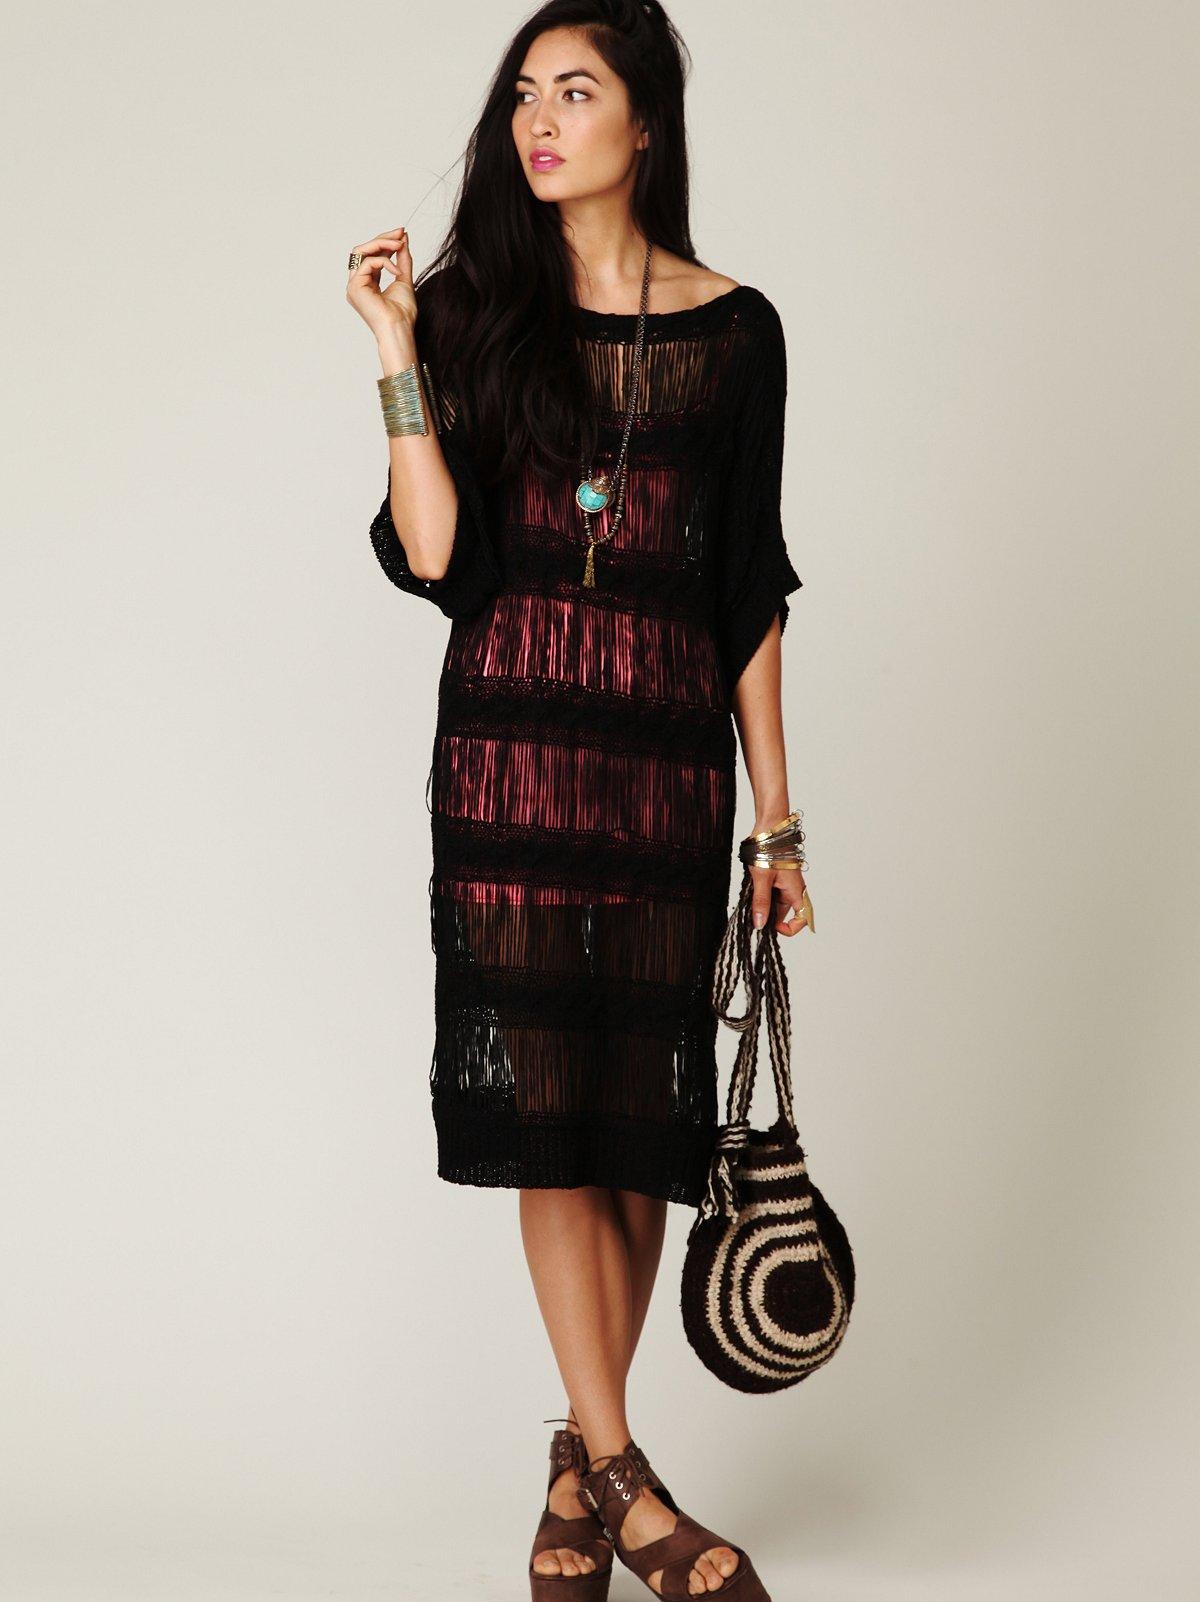 Valhala Dress